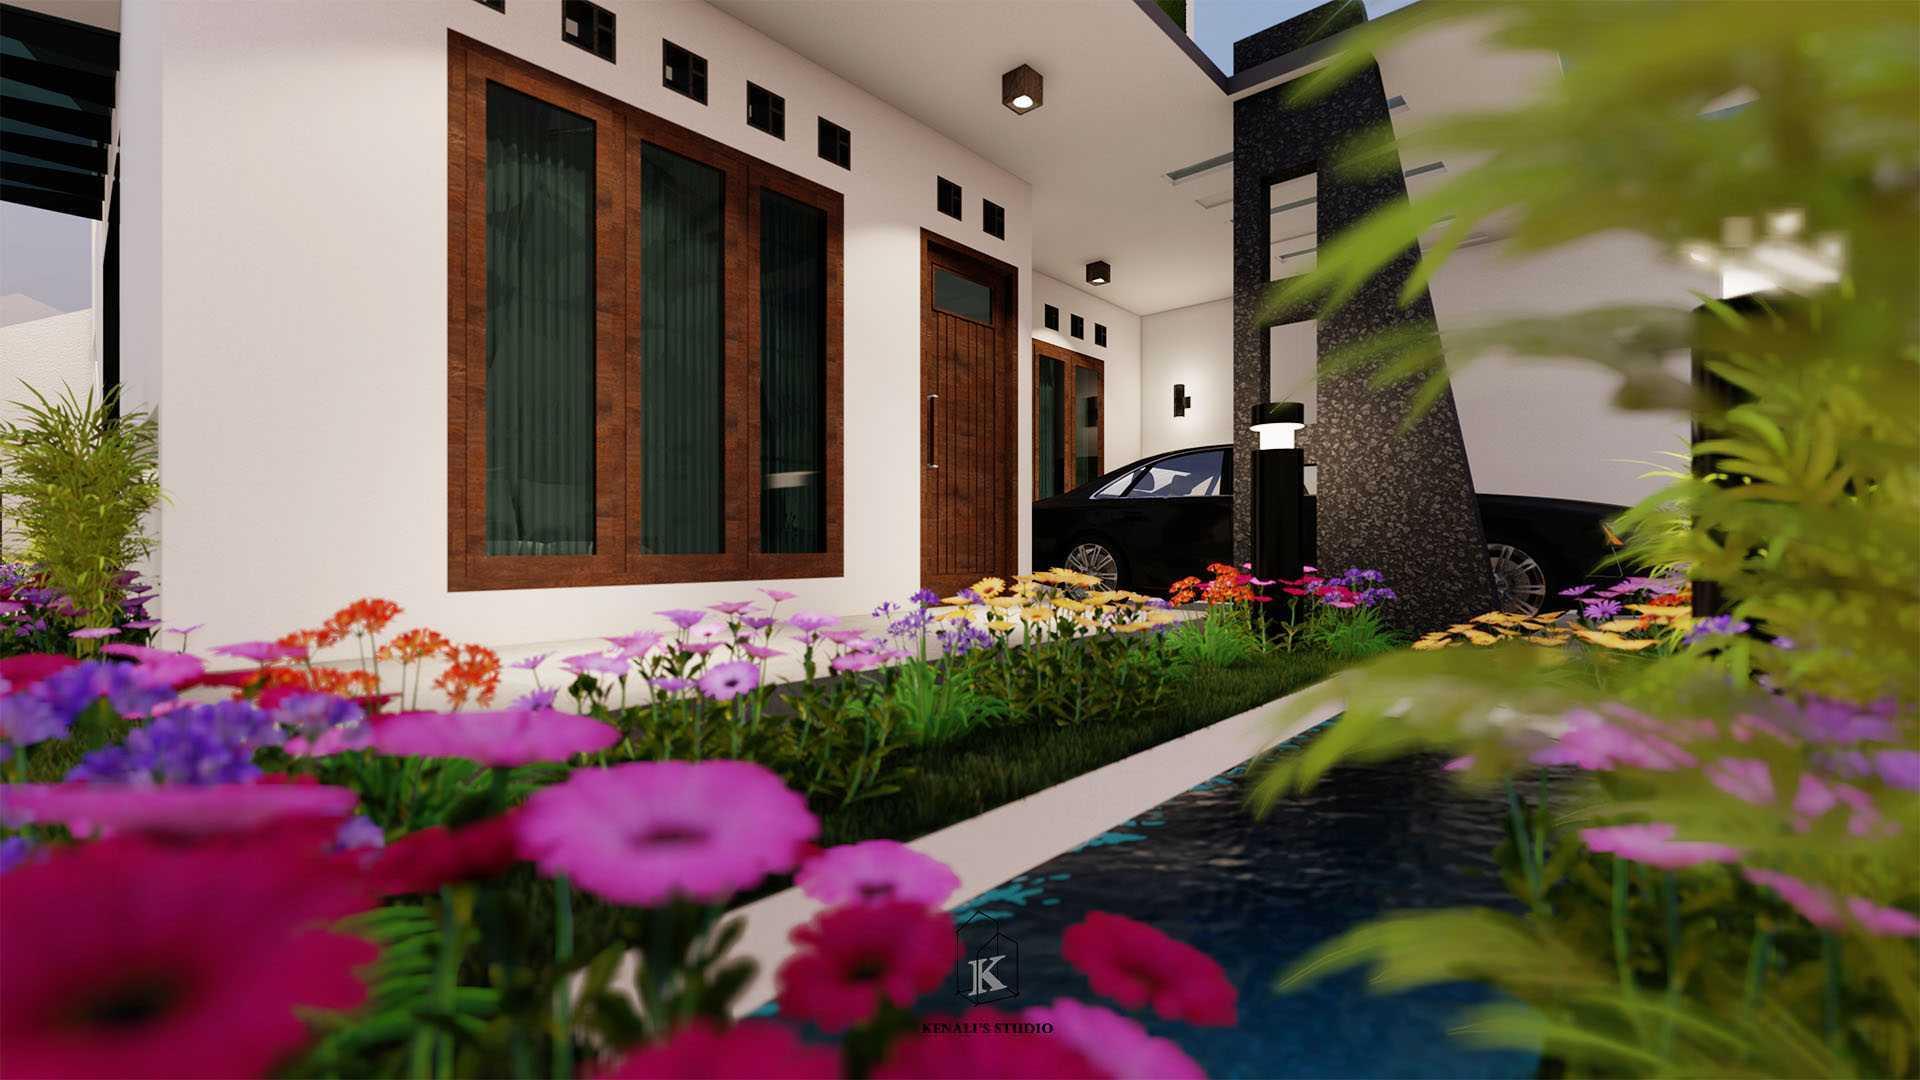 Kenali's Studio Yr - House Kec. Serpong, Kota Tangerang Selatan, Banten, Indonesia Kec. Serpong, Kota Tangerang Selatan, Banten, Indonesia Kenalis-Studio-Yr-House Contemporary  93646